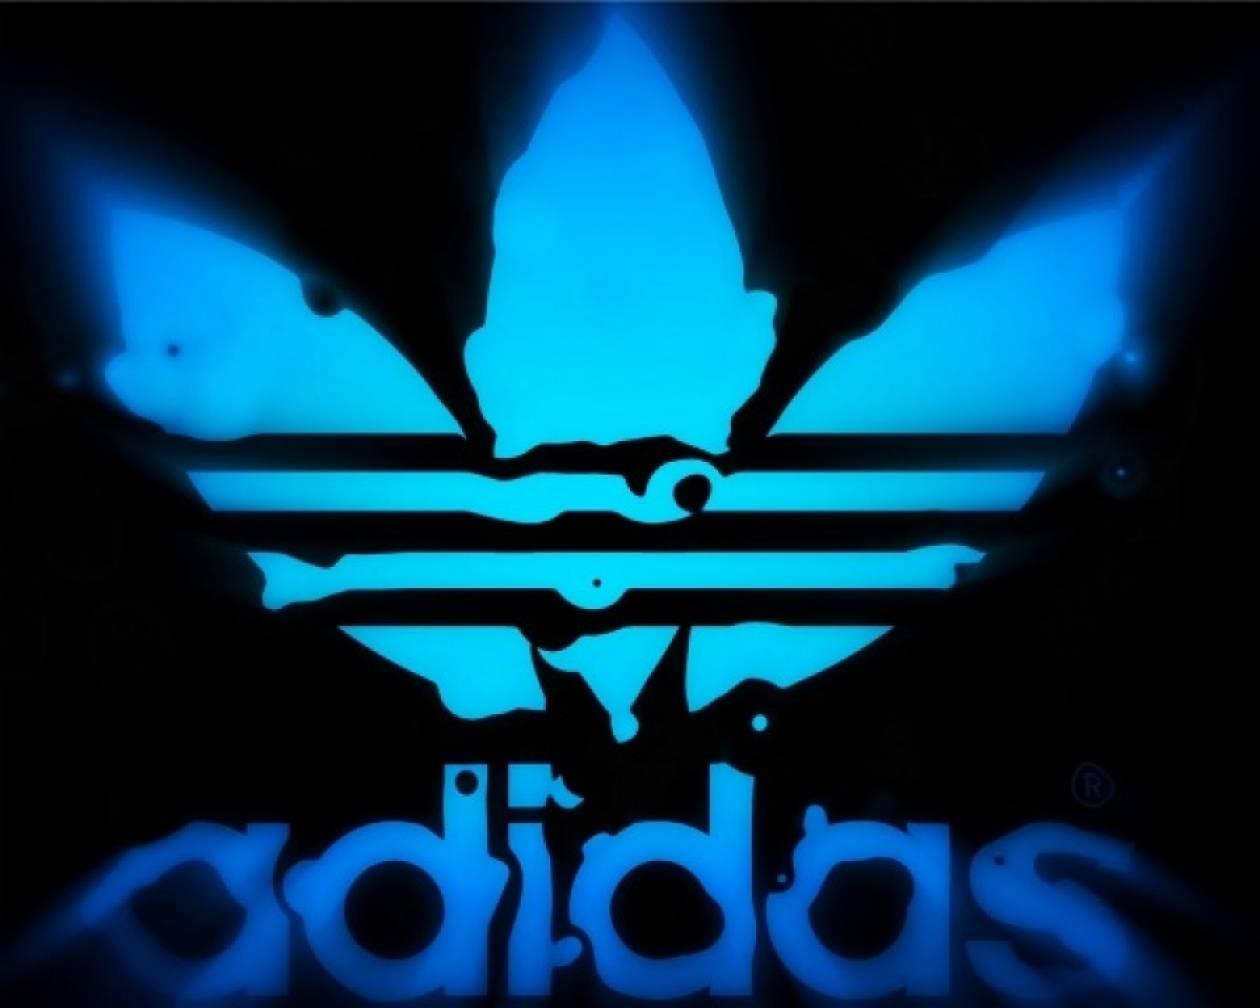 Hackers επιτέθηκαν στην ιστοσελίδα της Adidas